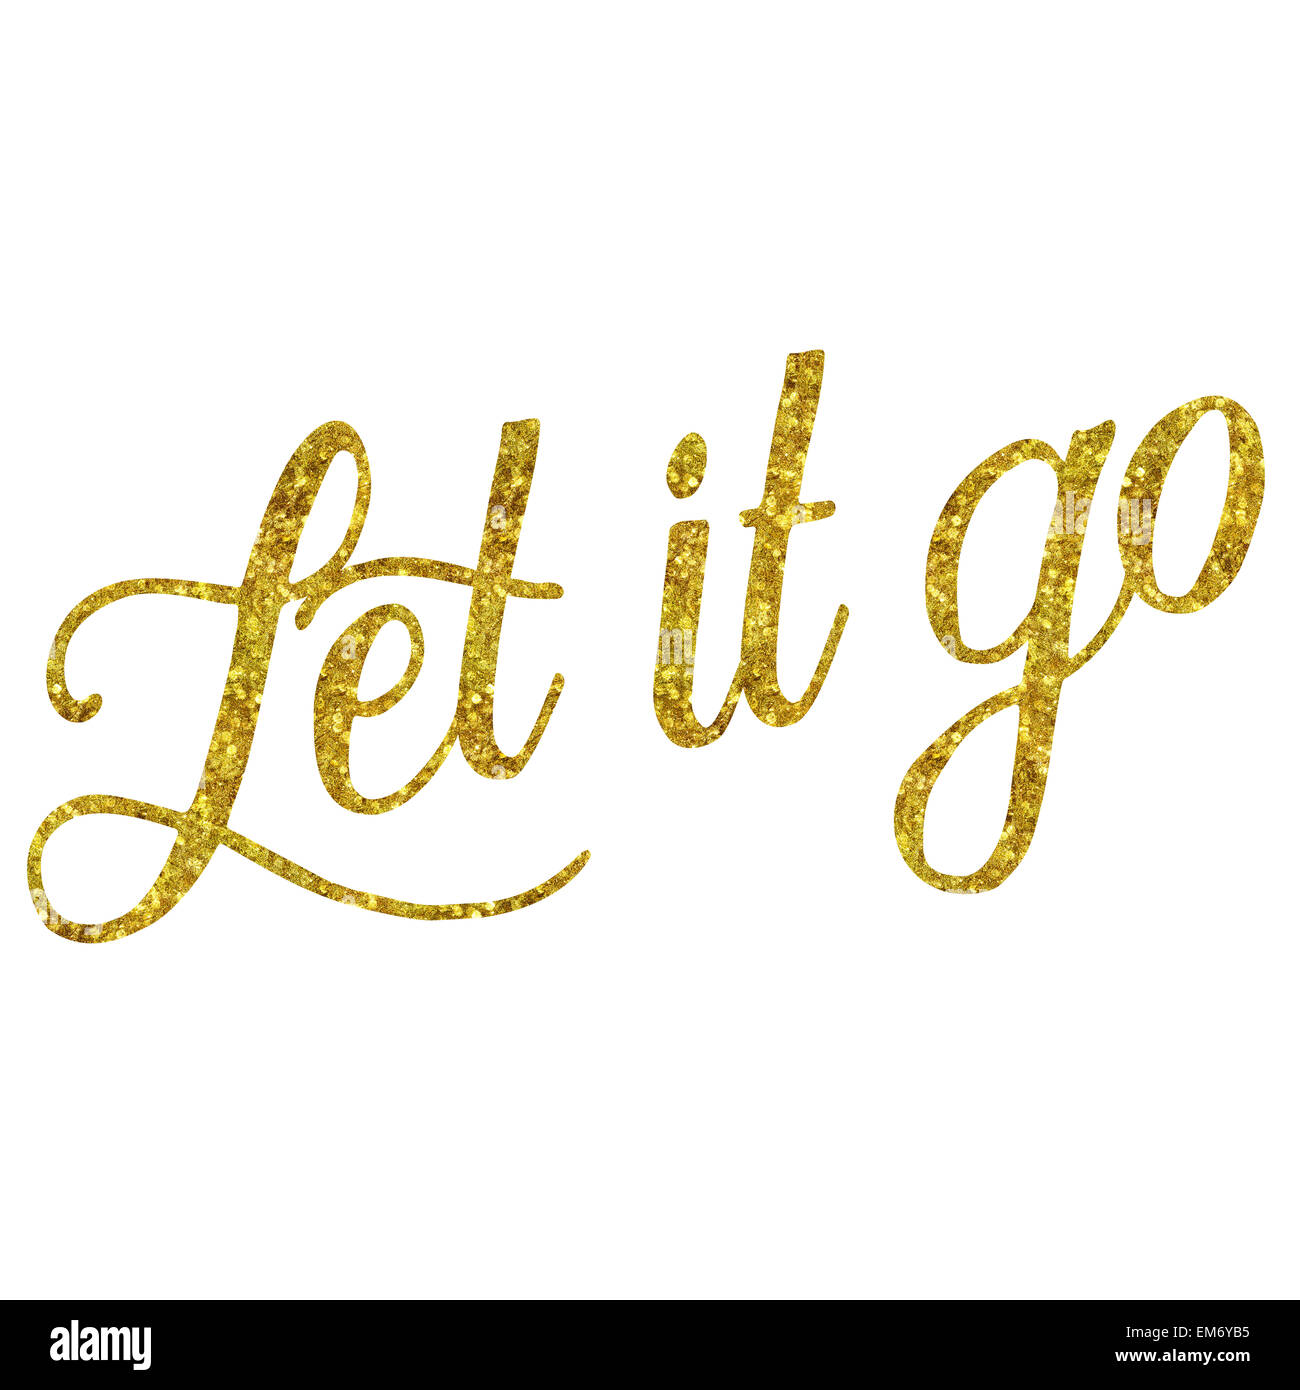 Let It Go Glittery Gold Faux Foil Metallic Inspirational ...